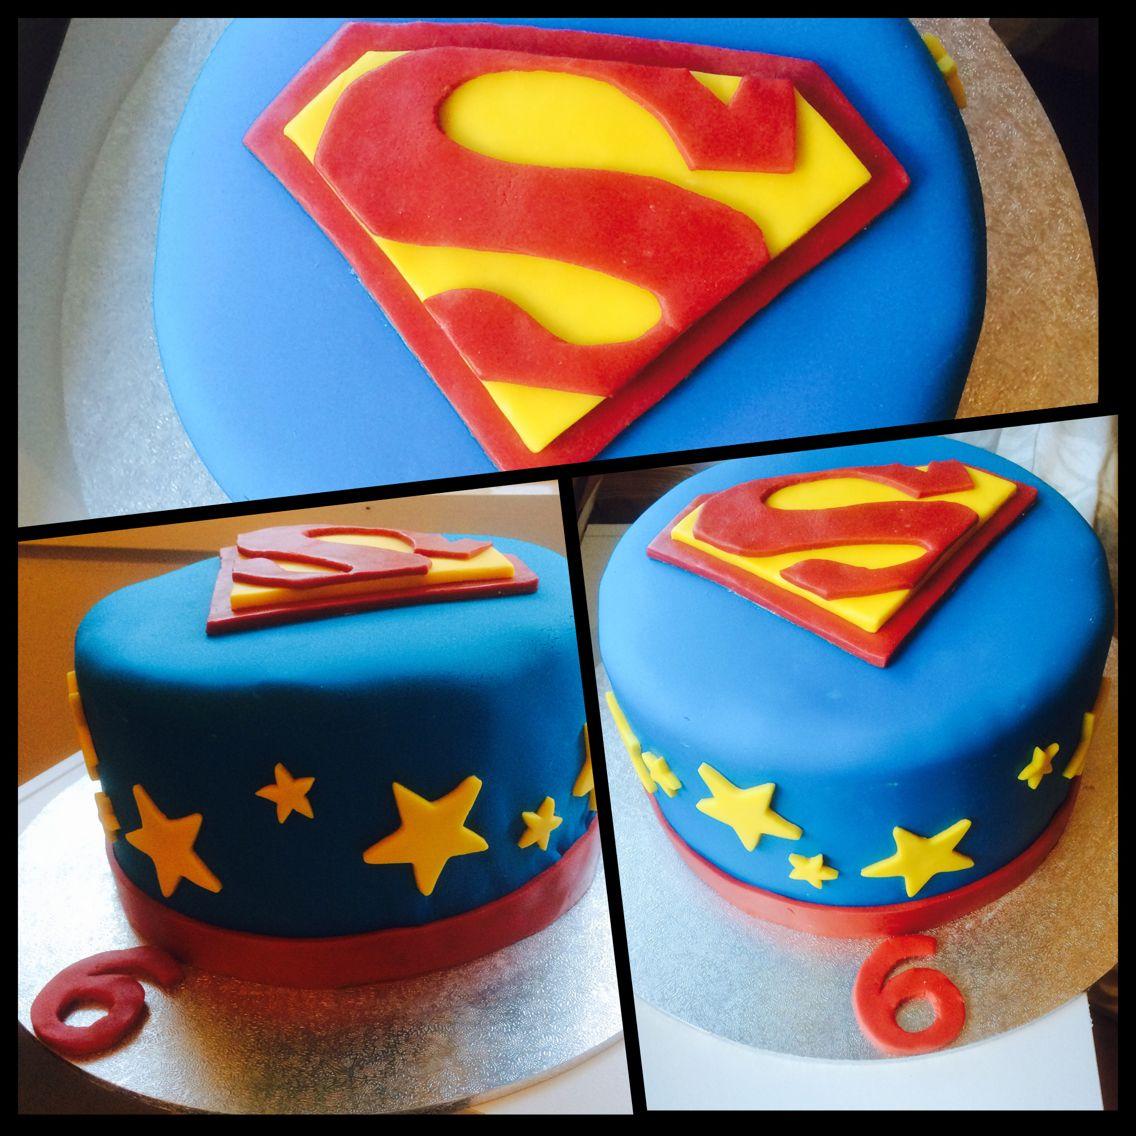 1000 ideas about superman cakes on pinterest batman cakes - Superman Cake Chocolate Cake And Fondant Happy 6th Birthday Liam